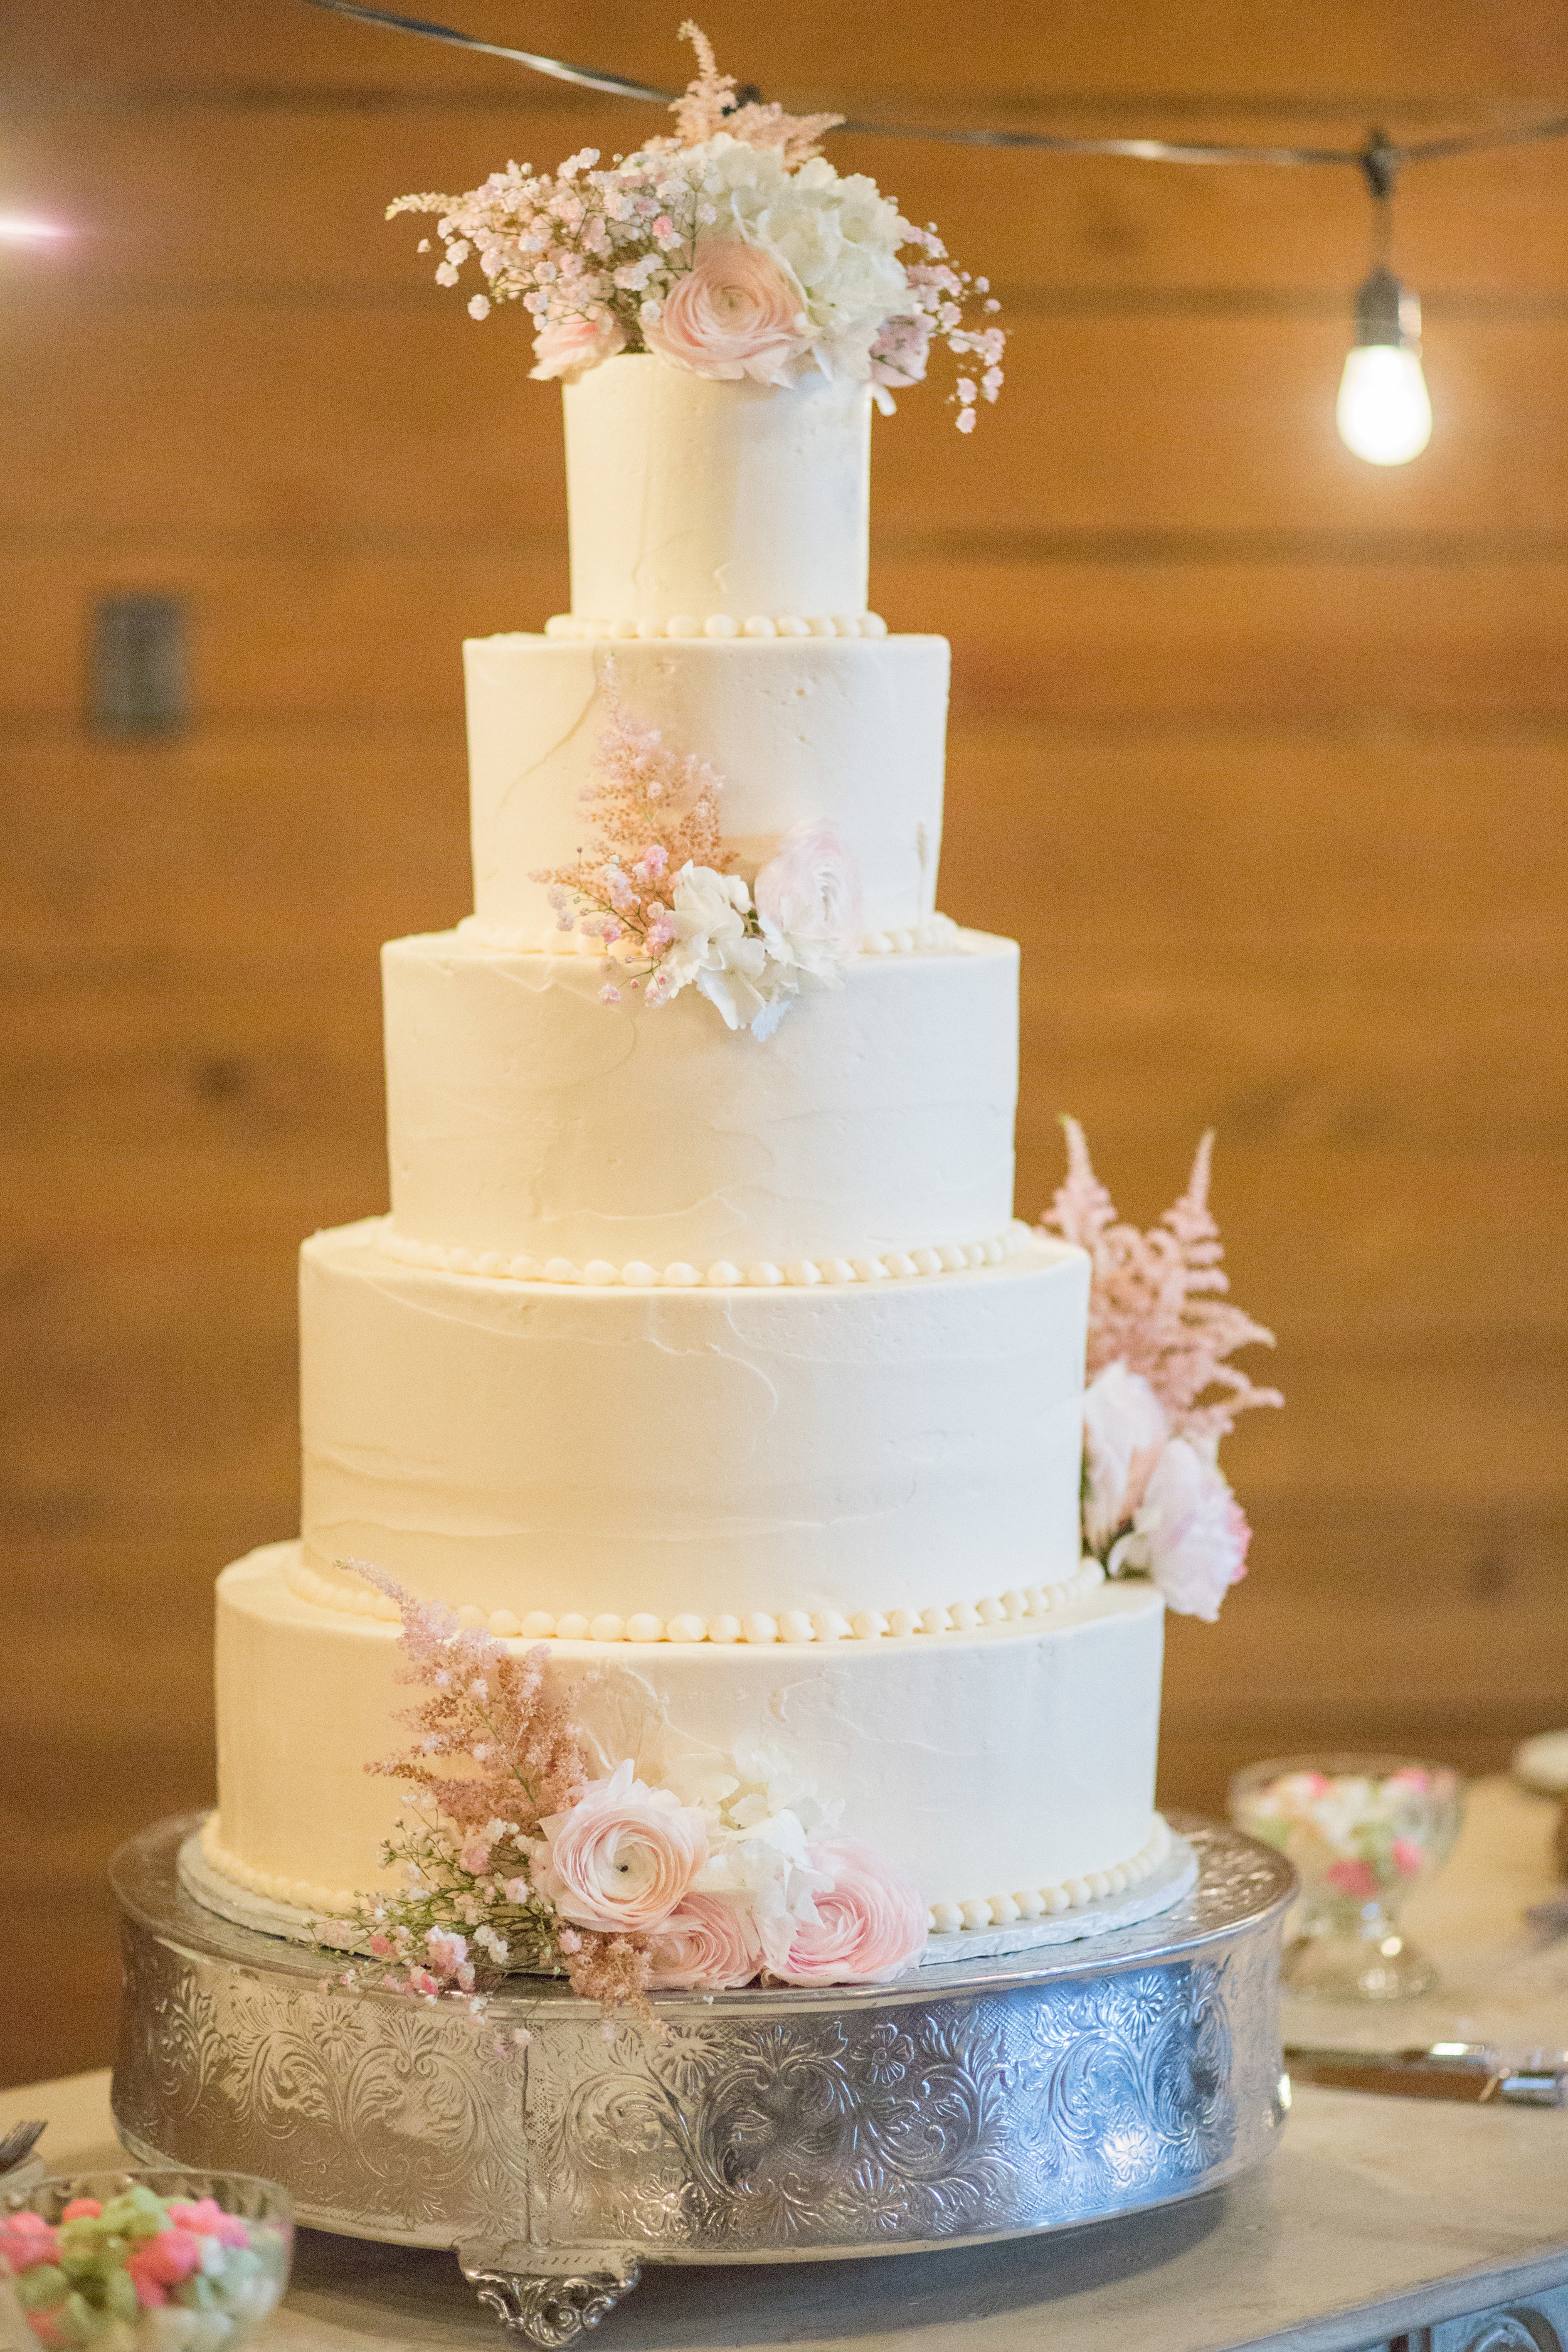 Sugar Bee Sweets Bakery  DallasFort Worth Wedding Cake Bakery  Custom Wedding Cakes